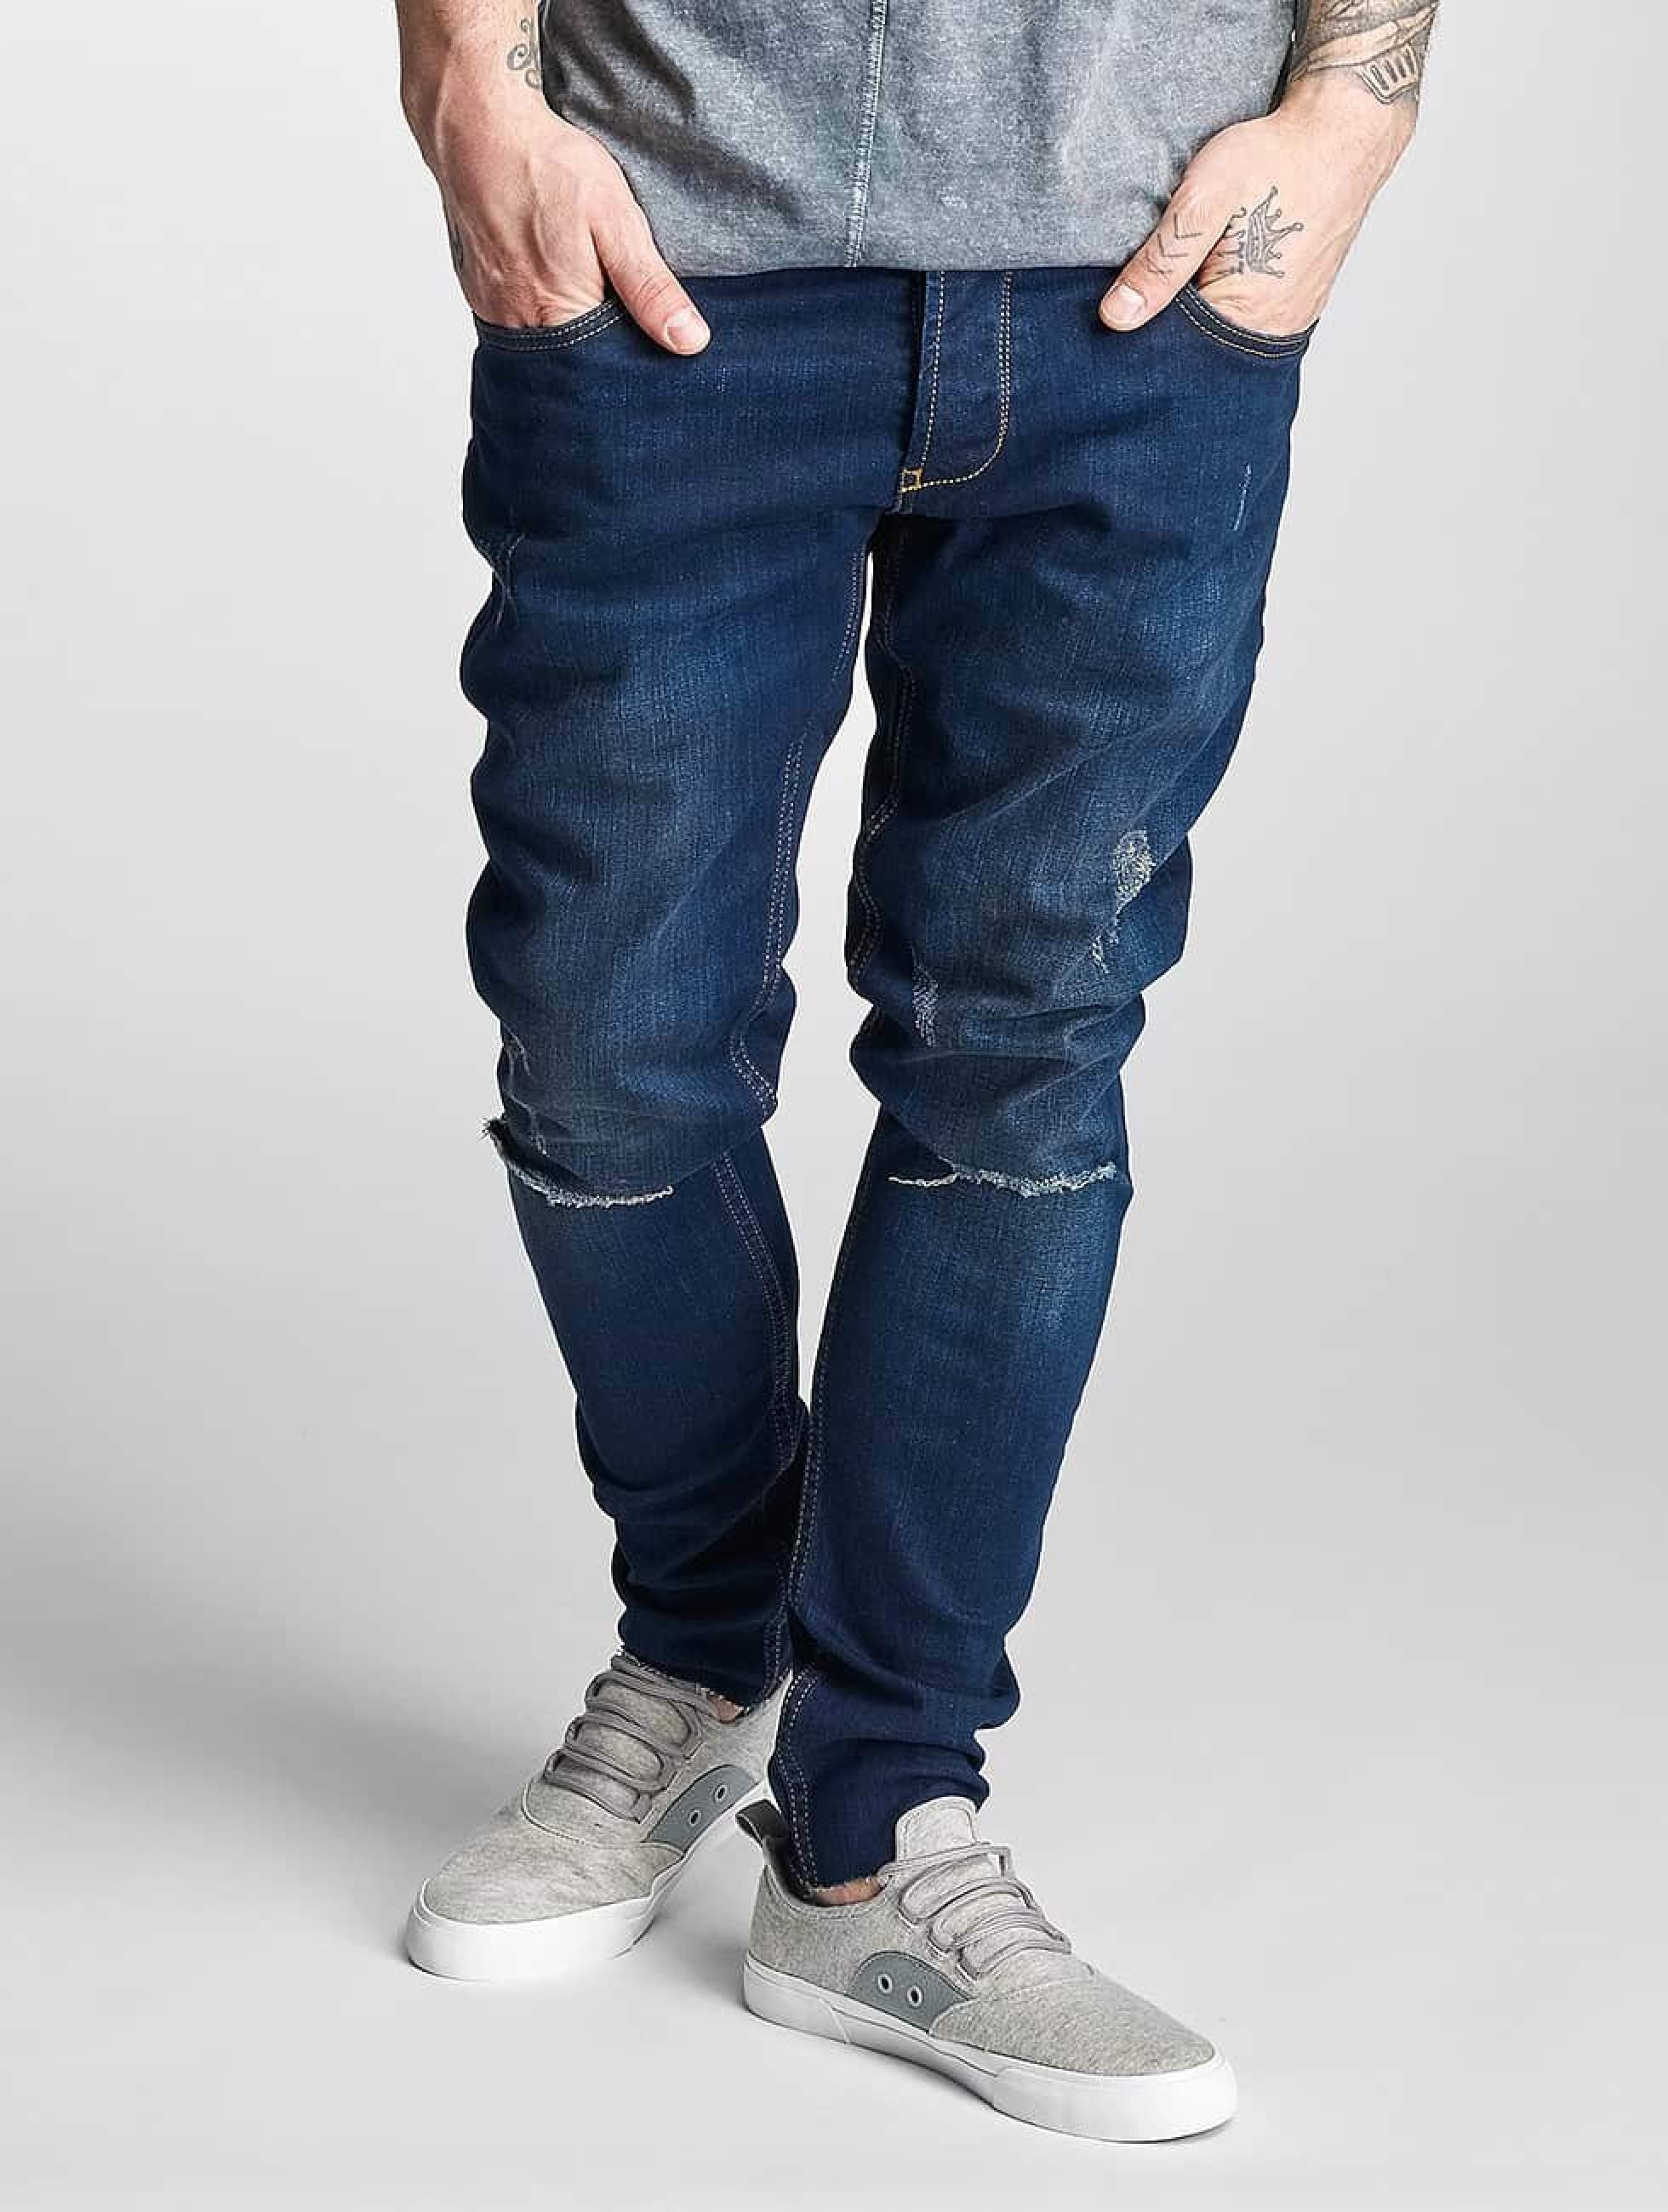 Bangastic / Slim Fit Jeans A75 in indigo W 33